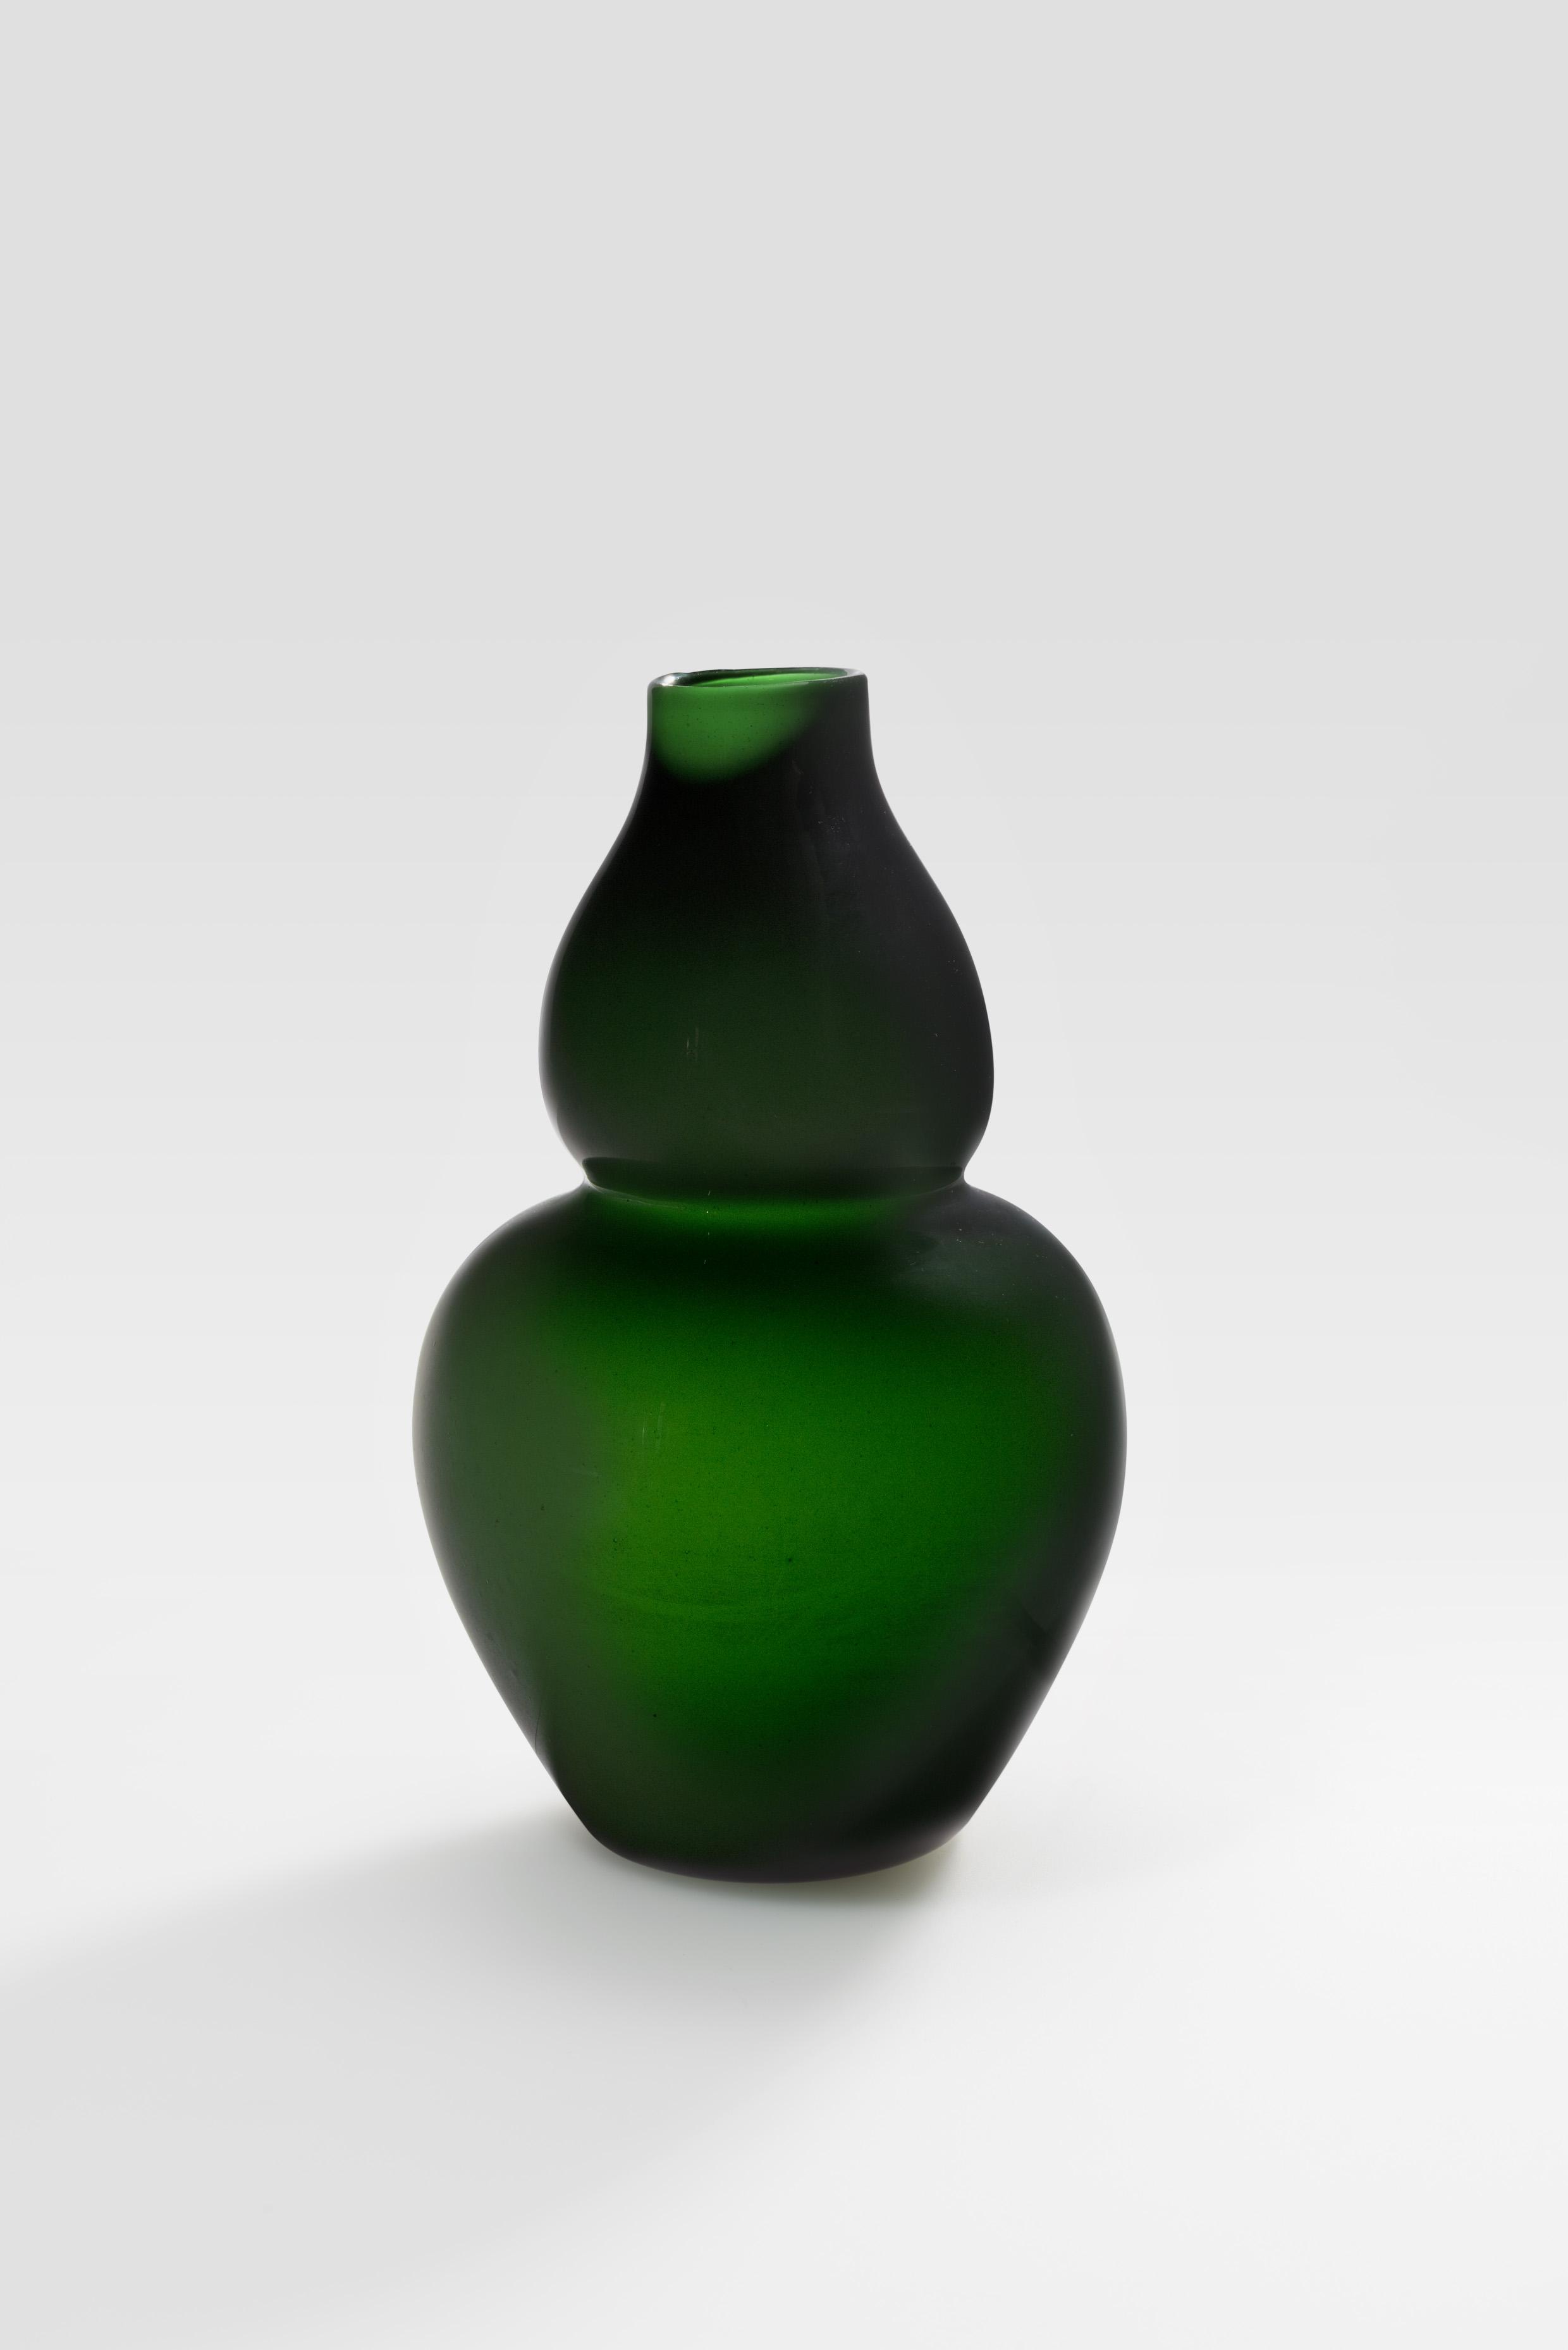 Die neue sammlung murano milano venezia glass vase cinese carlo scarpa fr venini c 1940 xxii floridaeventfo Image collections